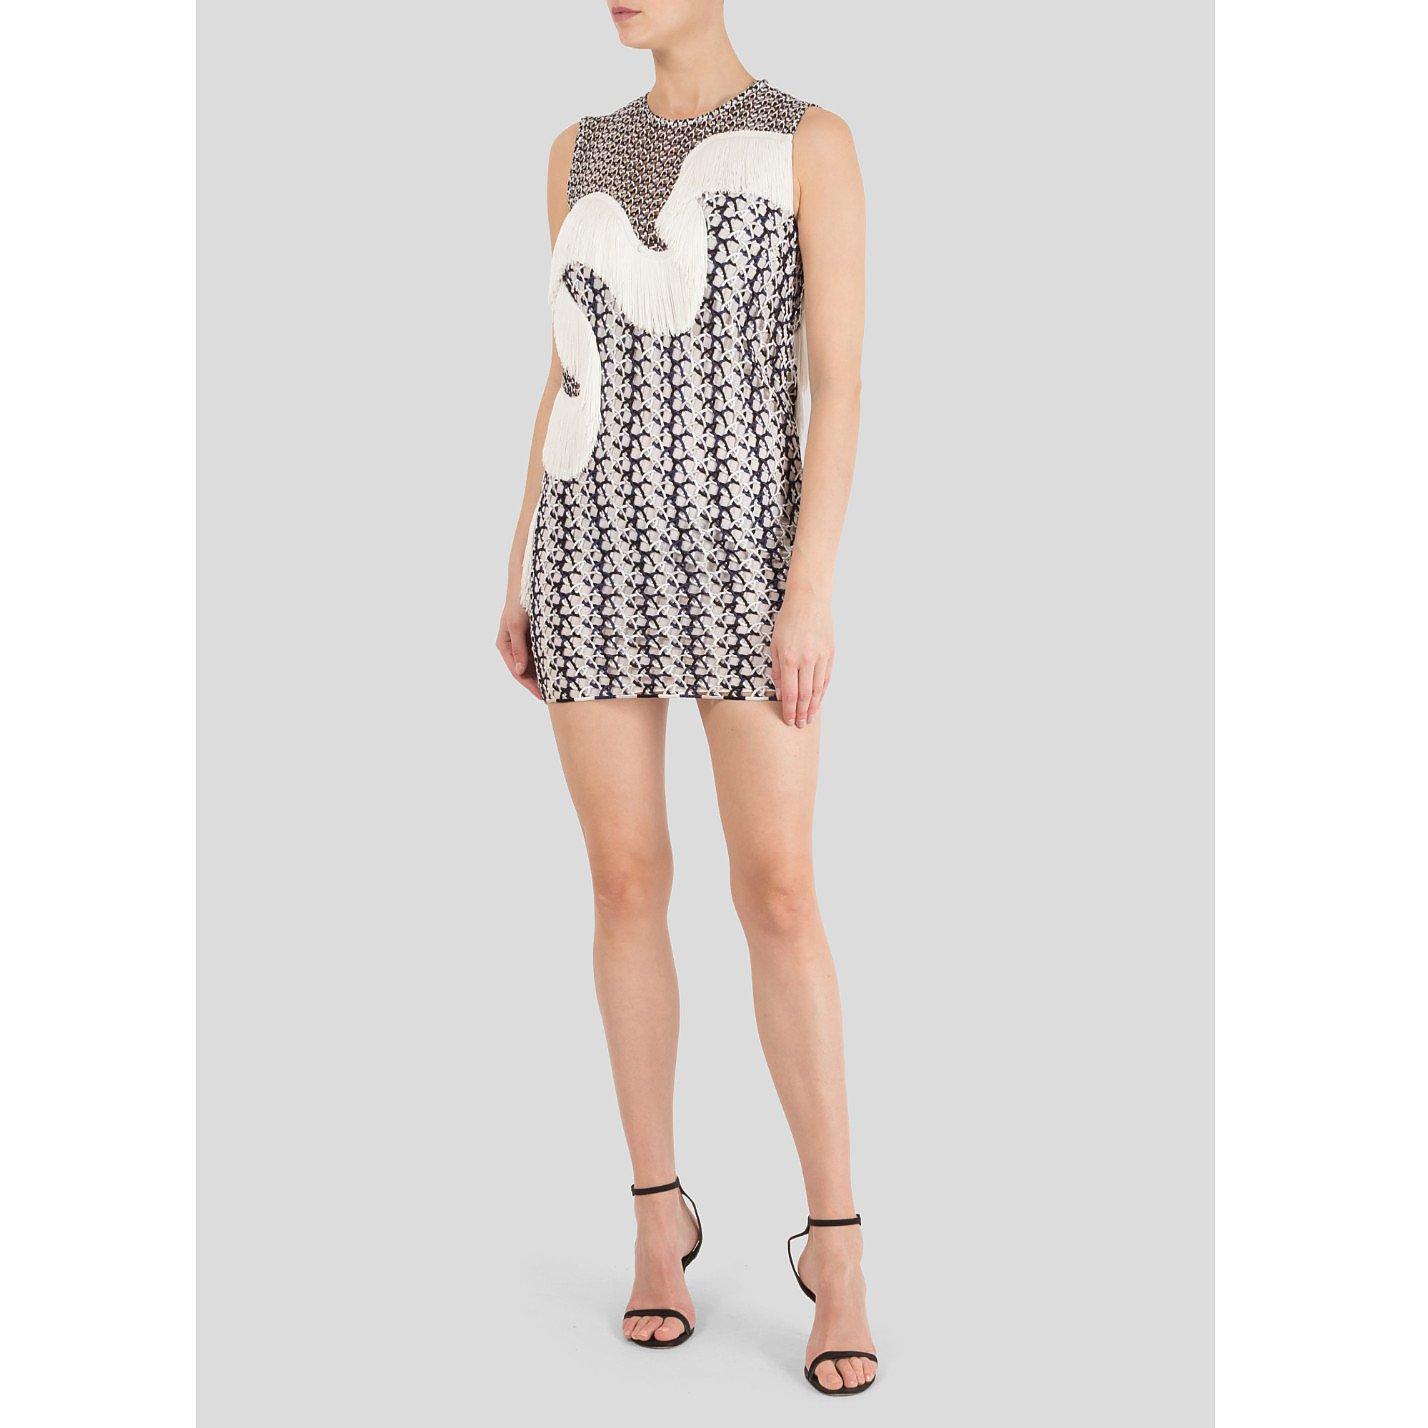 Stella McCartney Agatha Fringed Wicker Lace Mini Dress